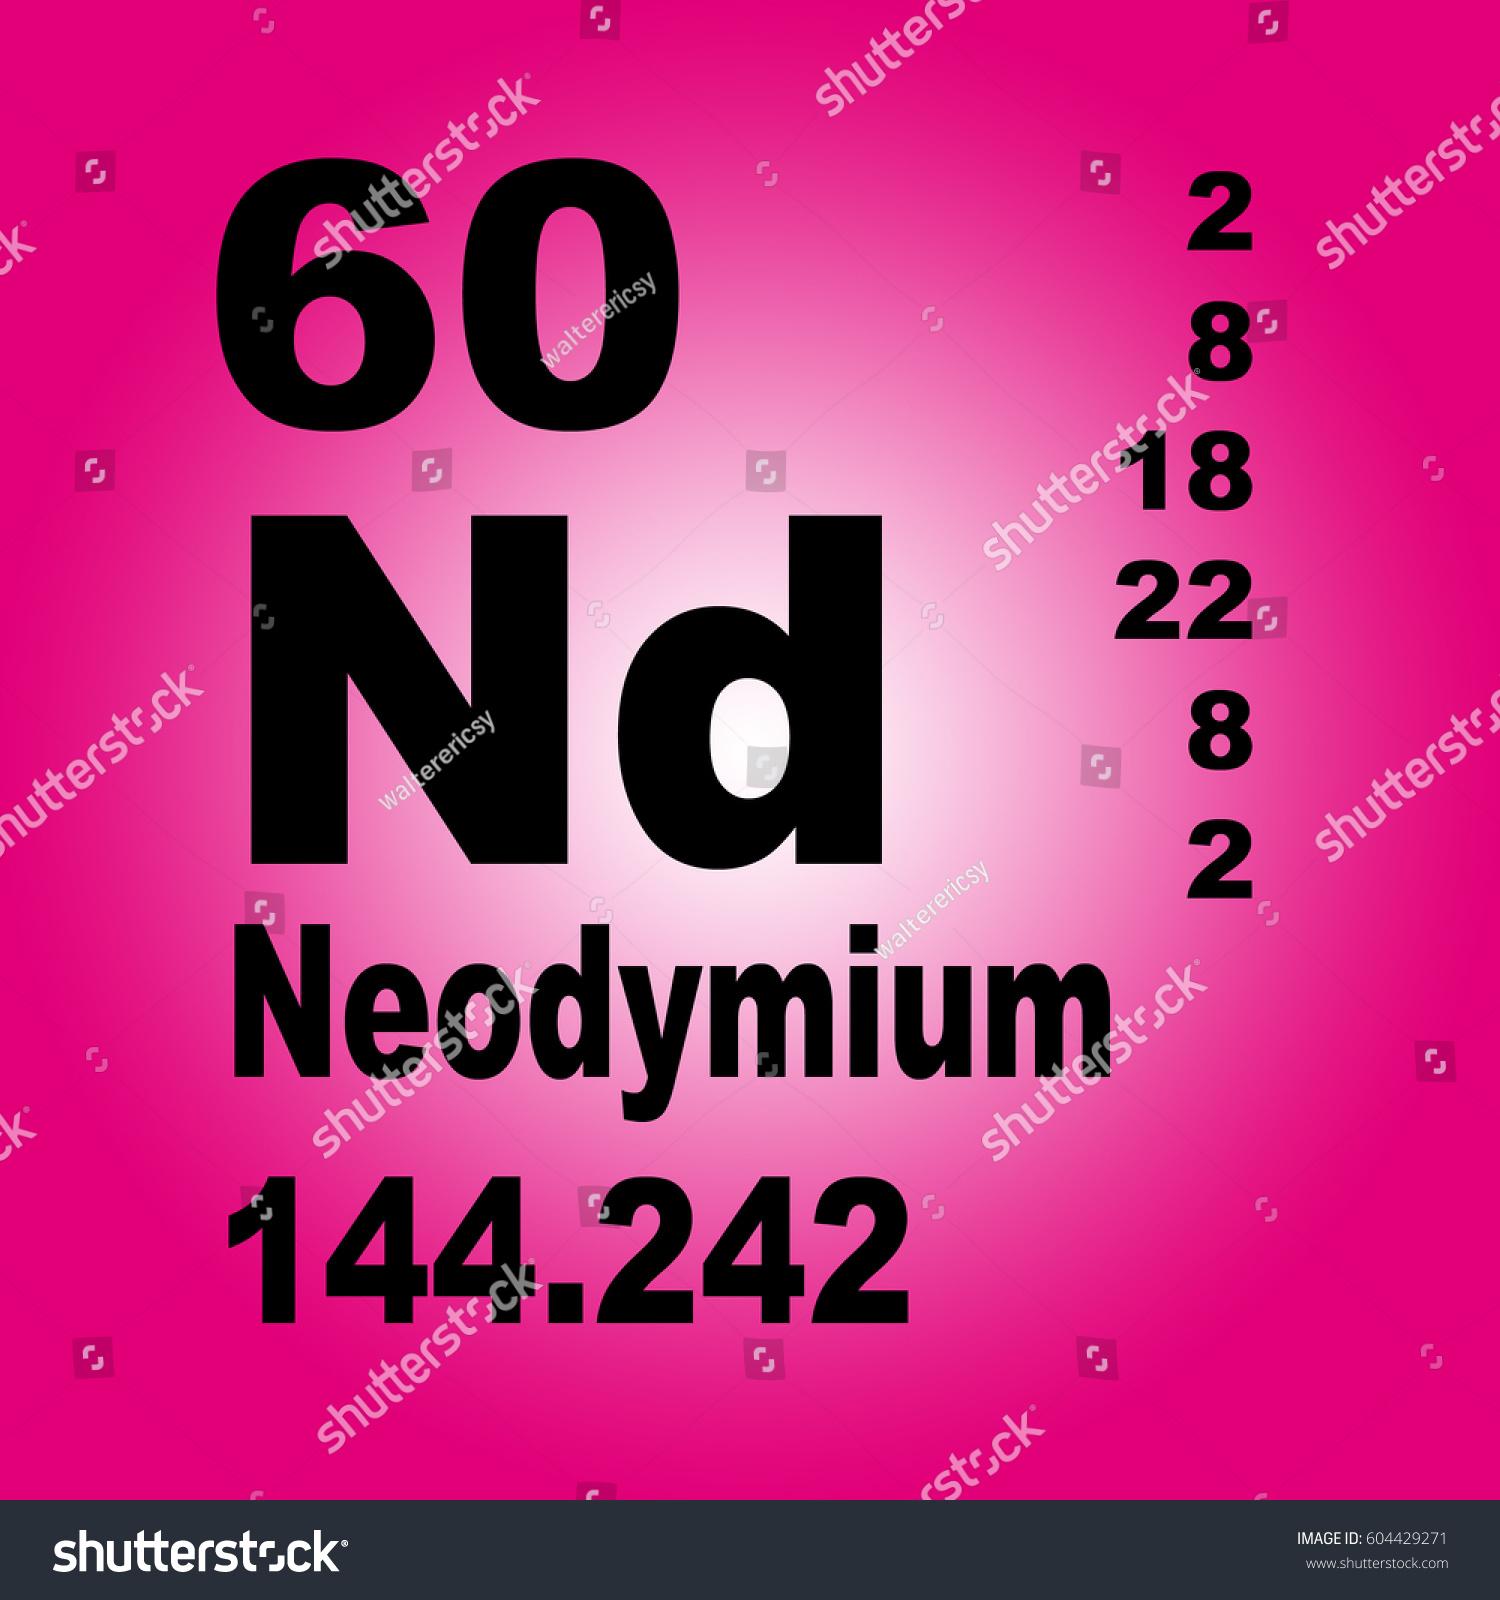 Neodymium periodic table elements stock illustration 604429271 neodymium periodic table of elements gamestrikefo Choice Image